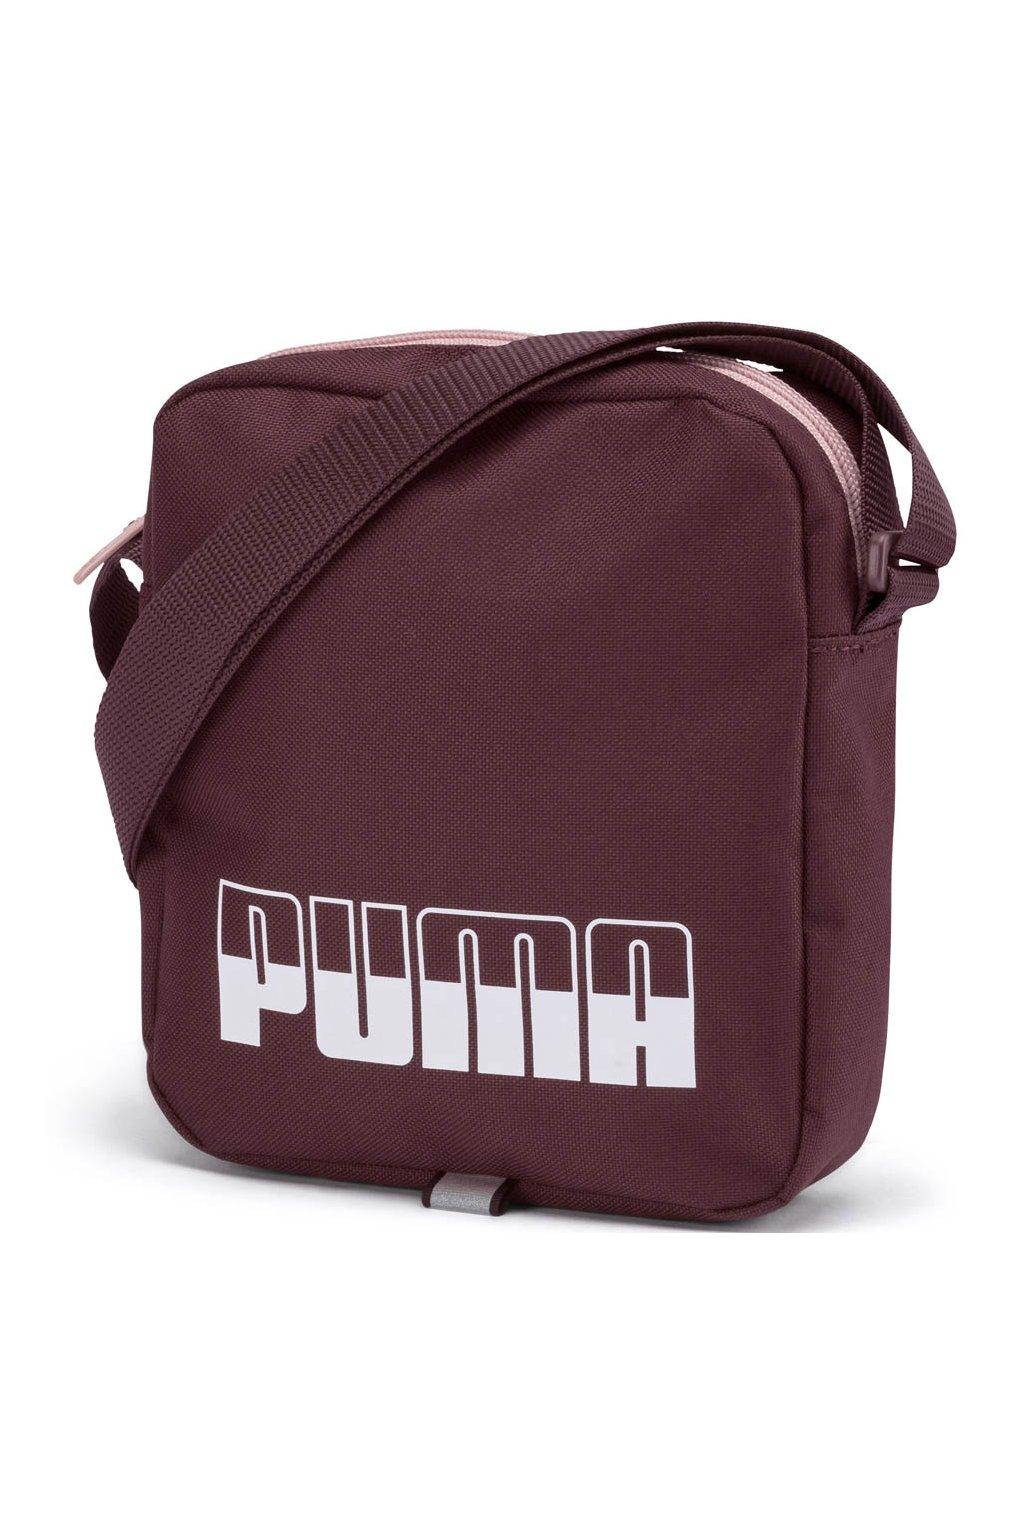 Taška Puma Plus II bordová 076061 08